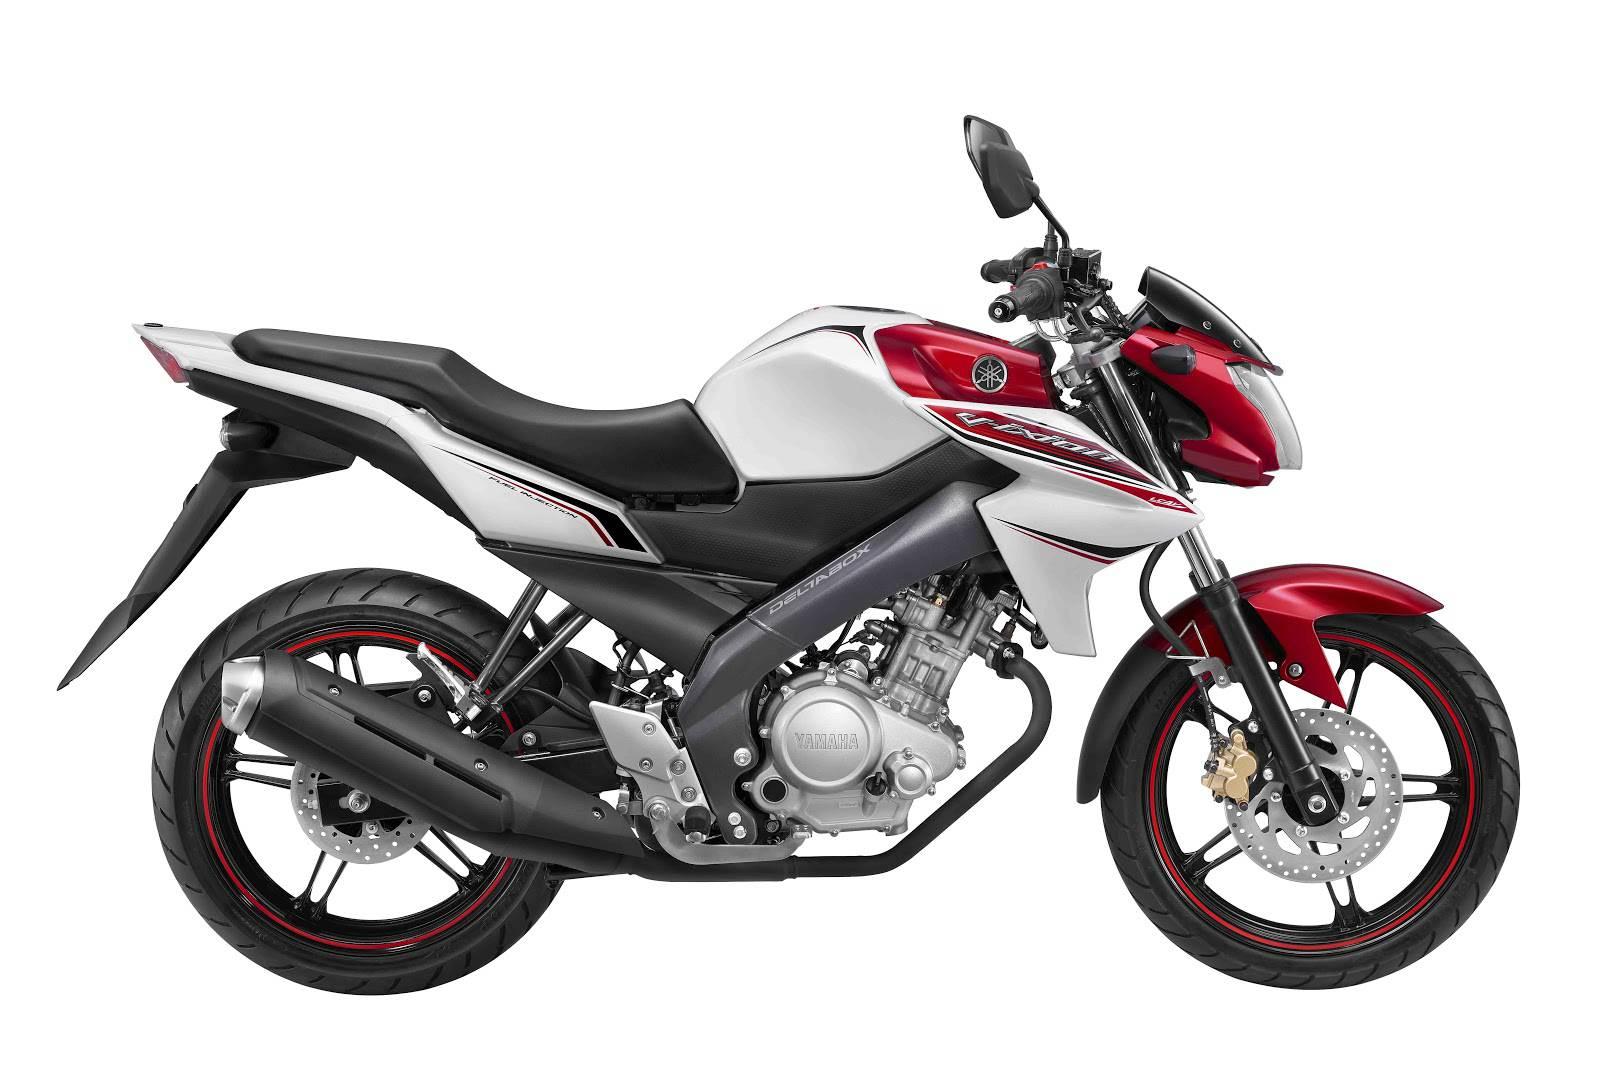 Yamaha New Vixion 2013 dan New Vixion Fairing dengan modifikasi yang  title=